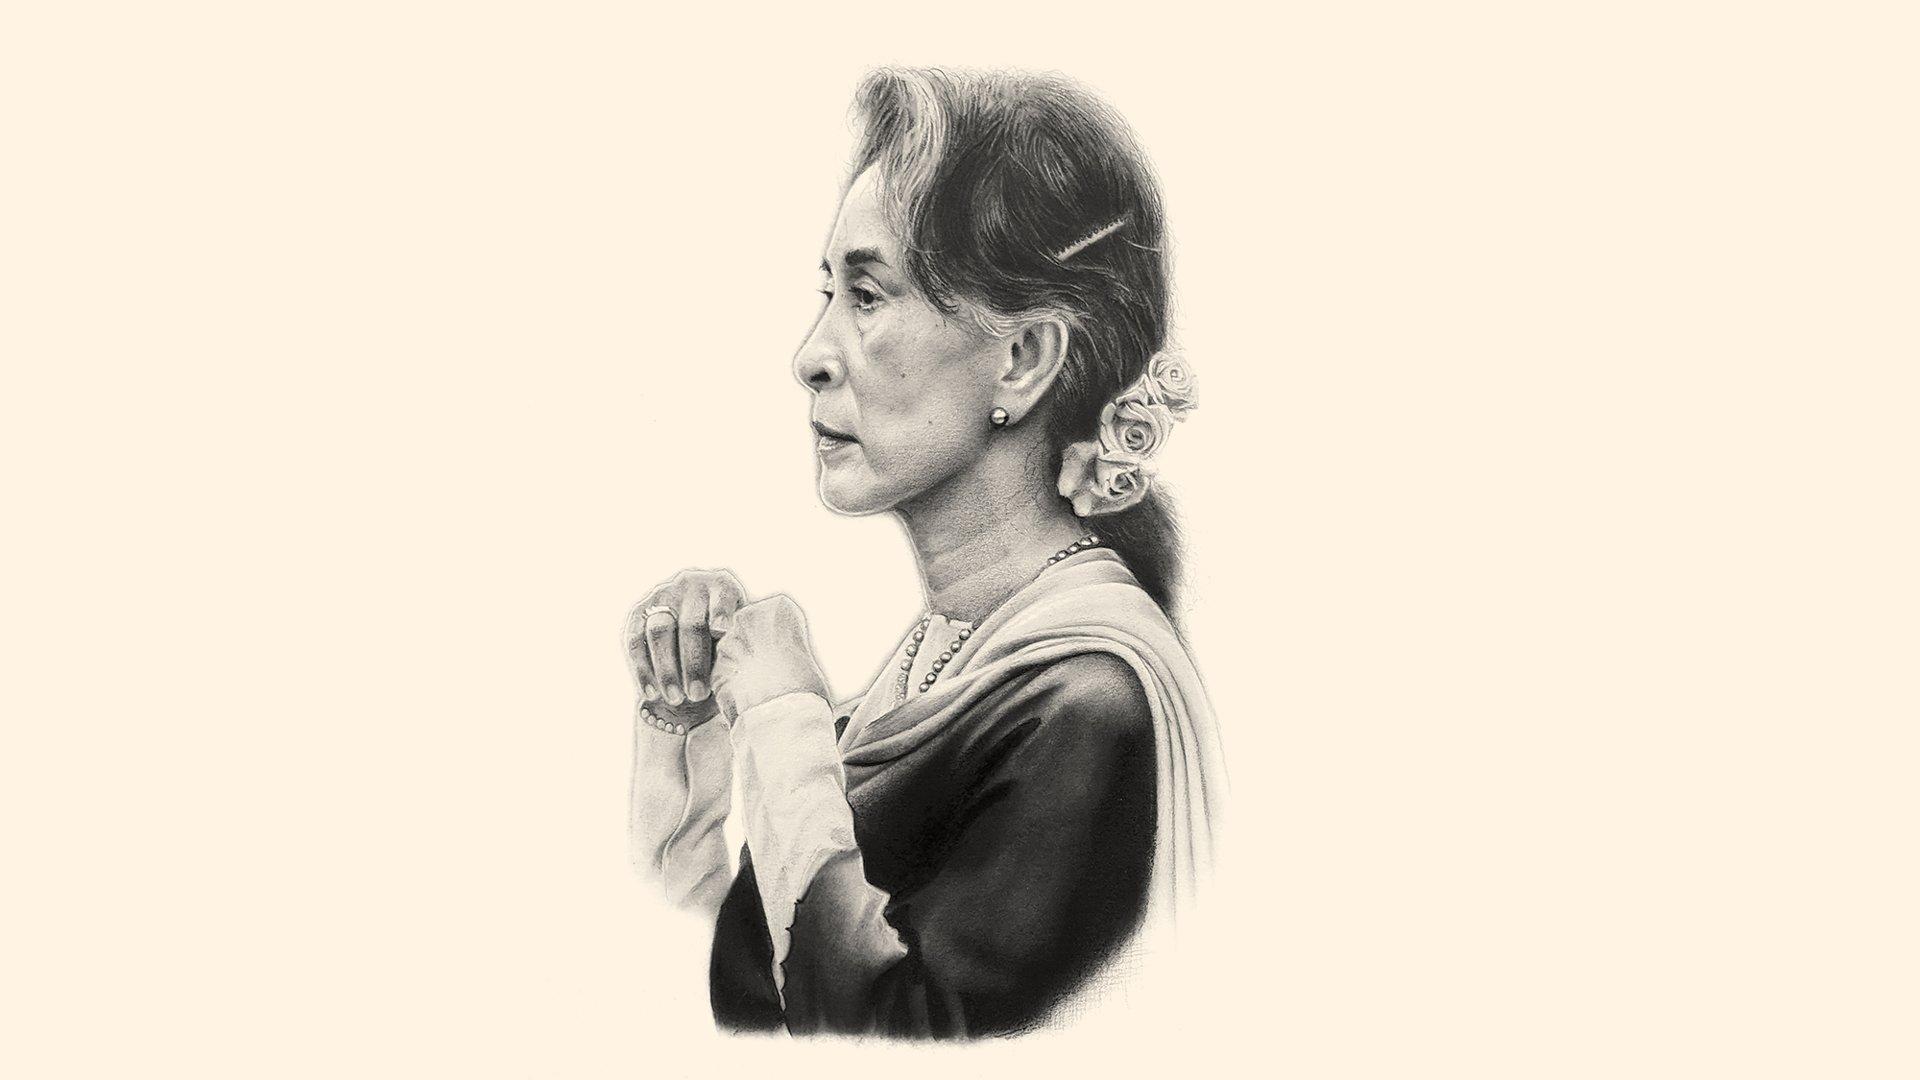 Aung San Suu Kyi and the Future of Myanmar - The Atlantic